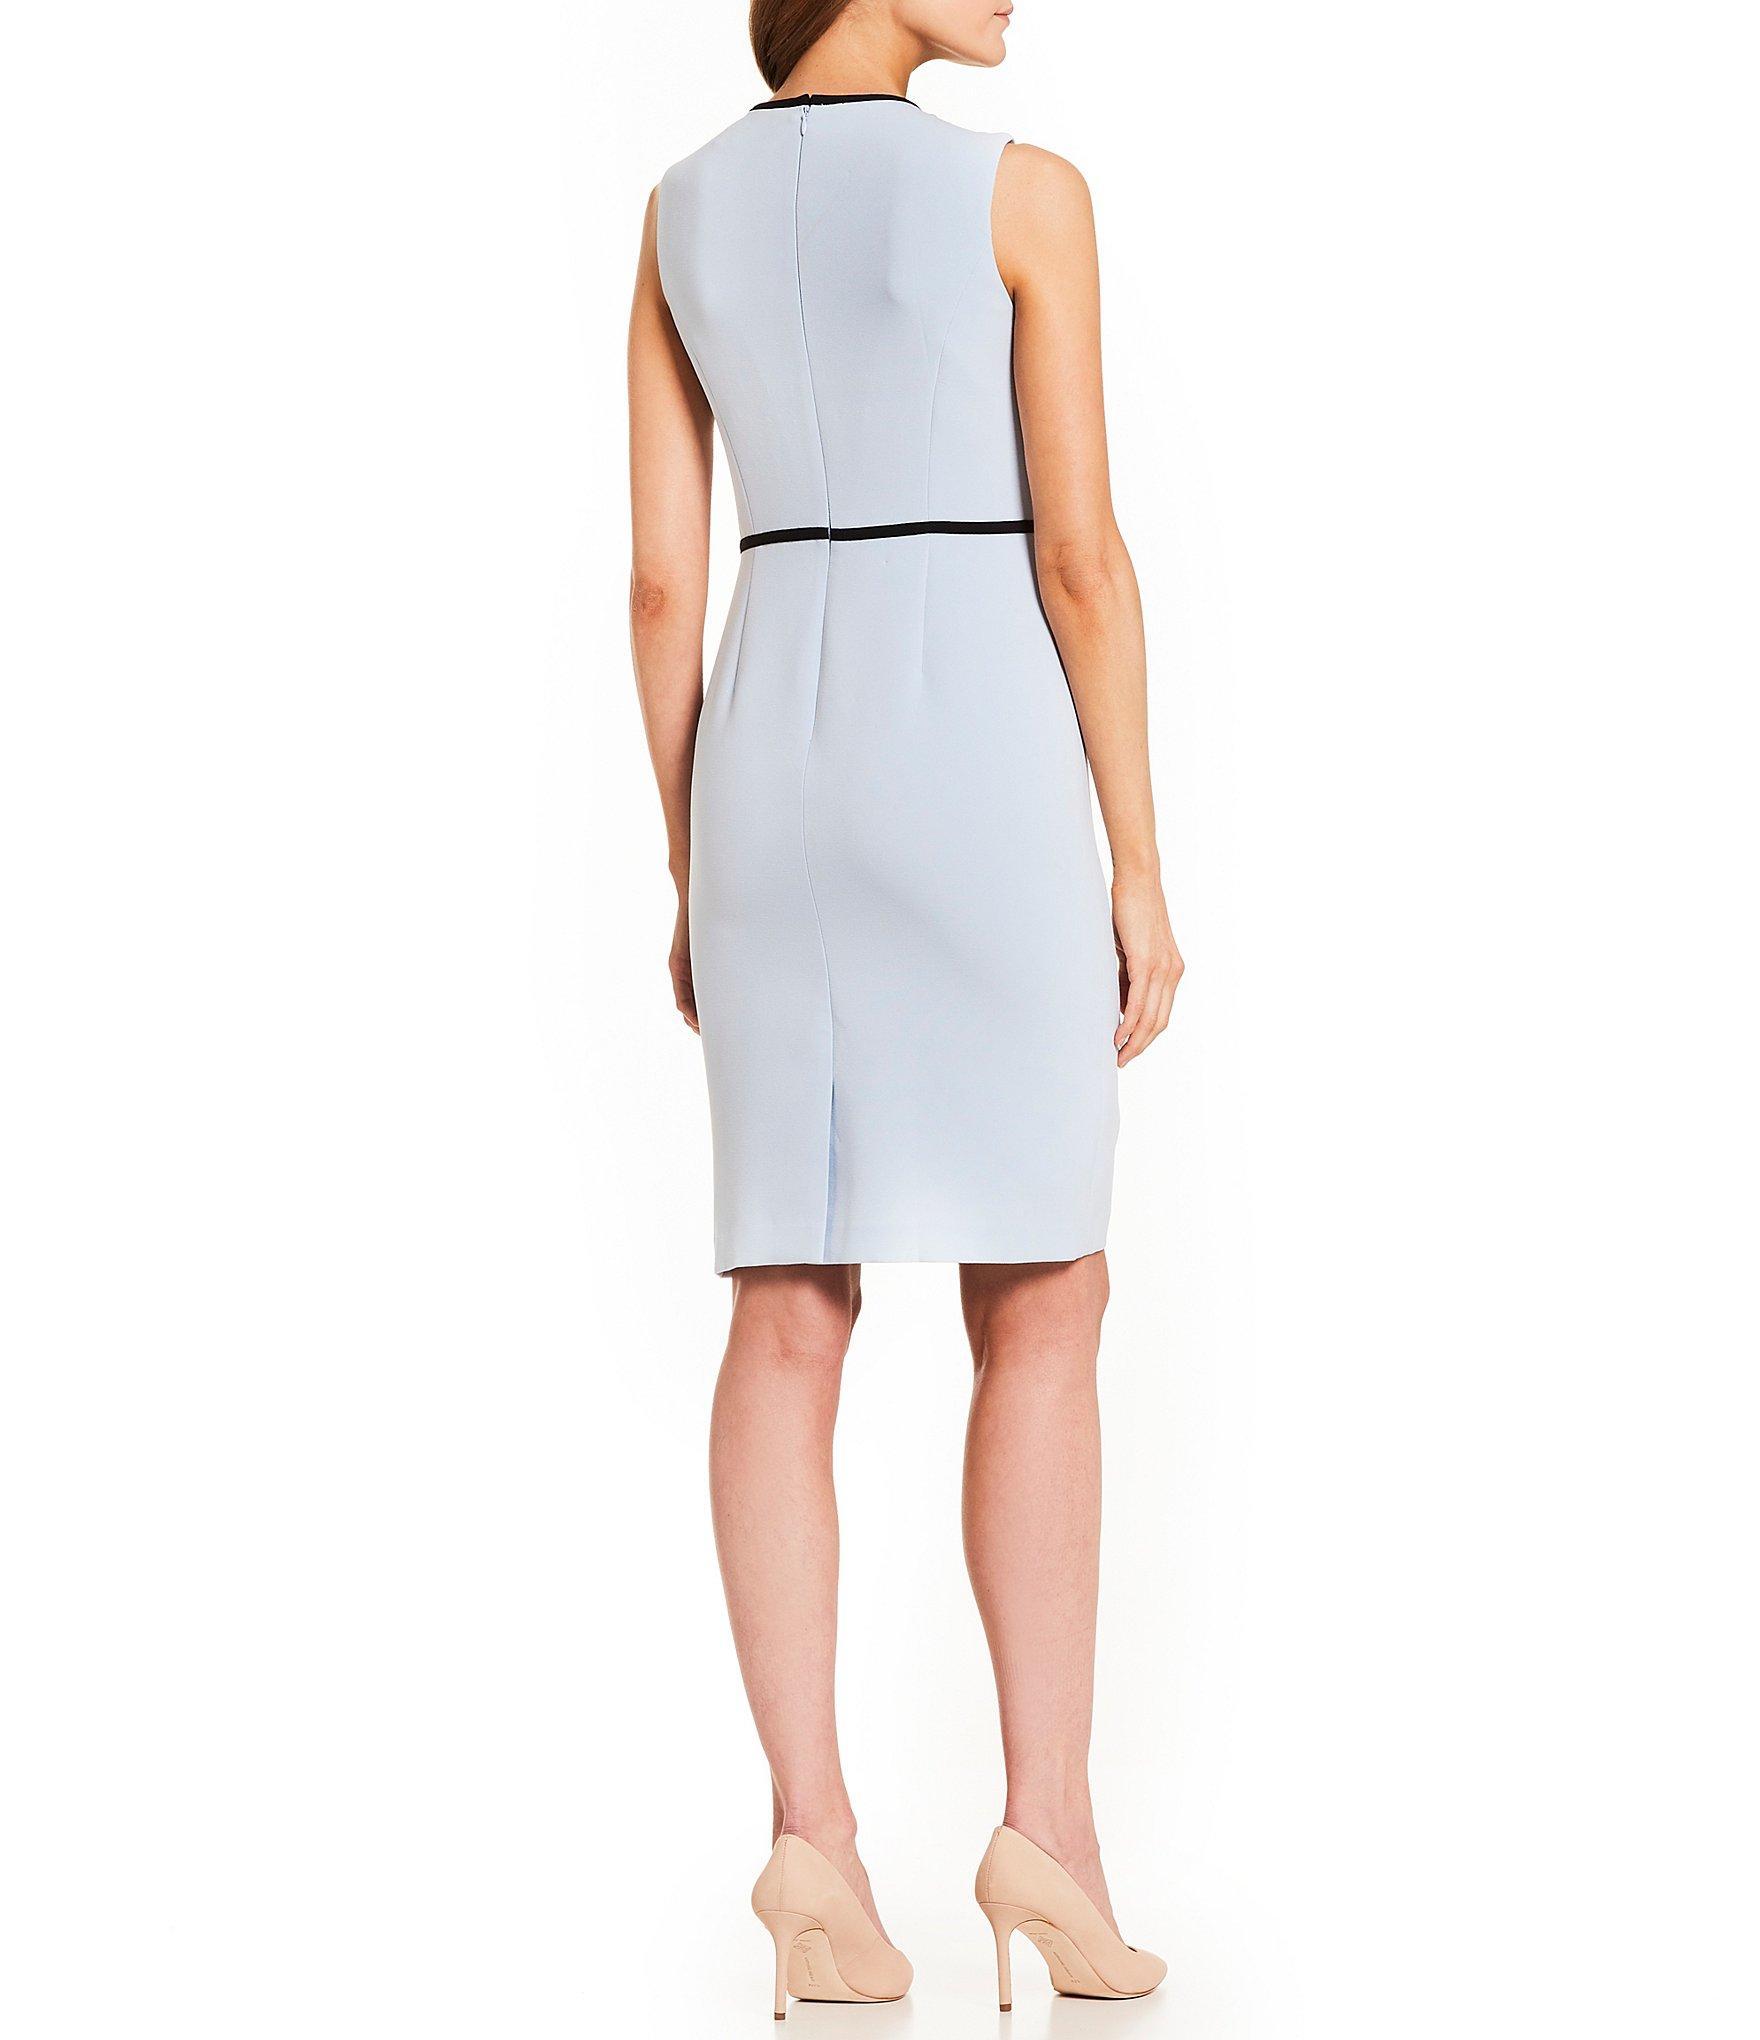 d8e4a0057c9 Kasper Plus Sleeveless Sheath Dress in Blue - Save 47% - Lyst